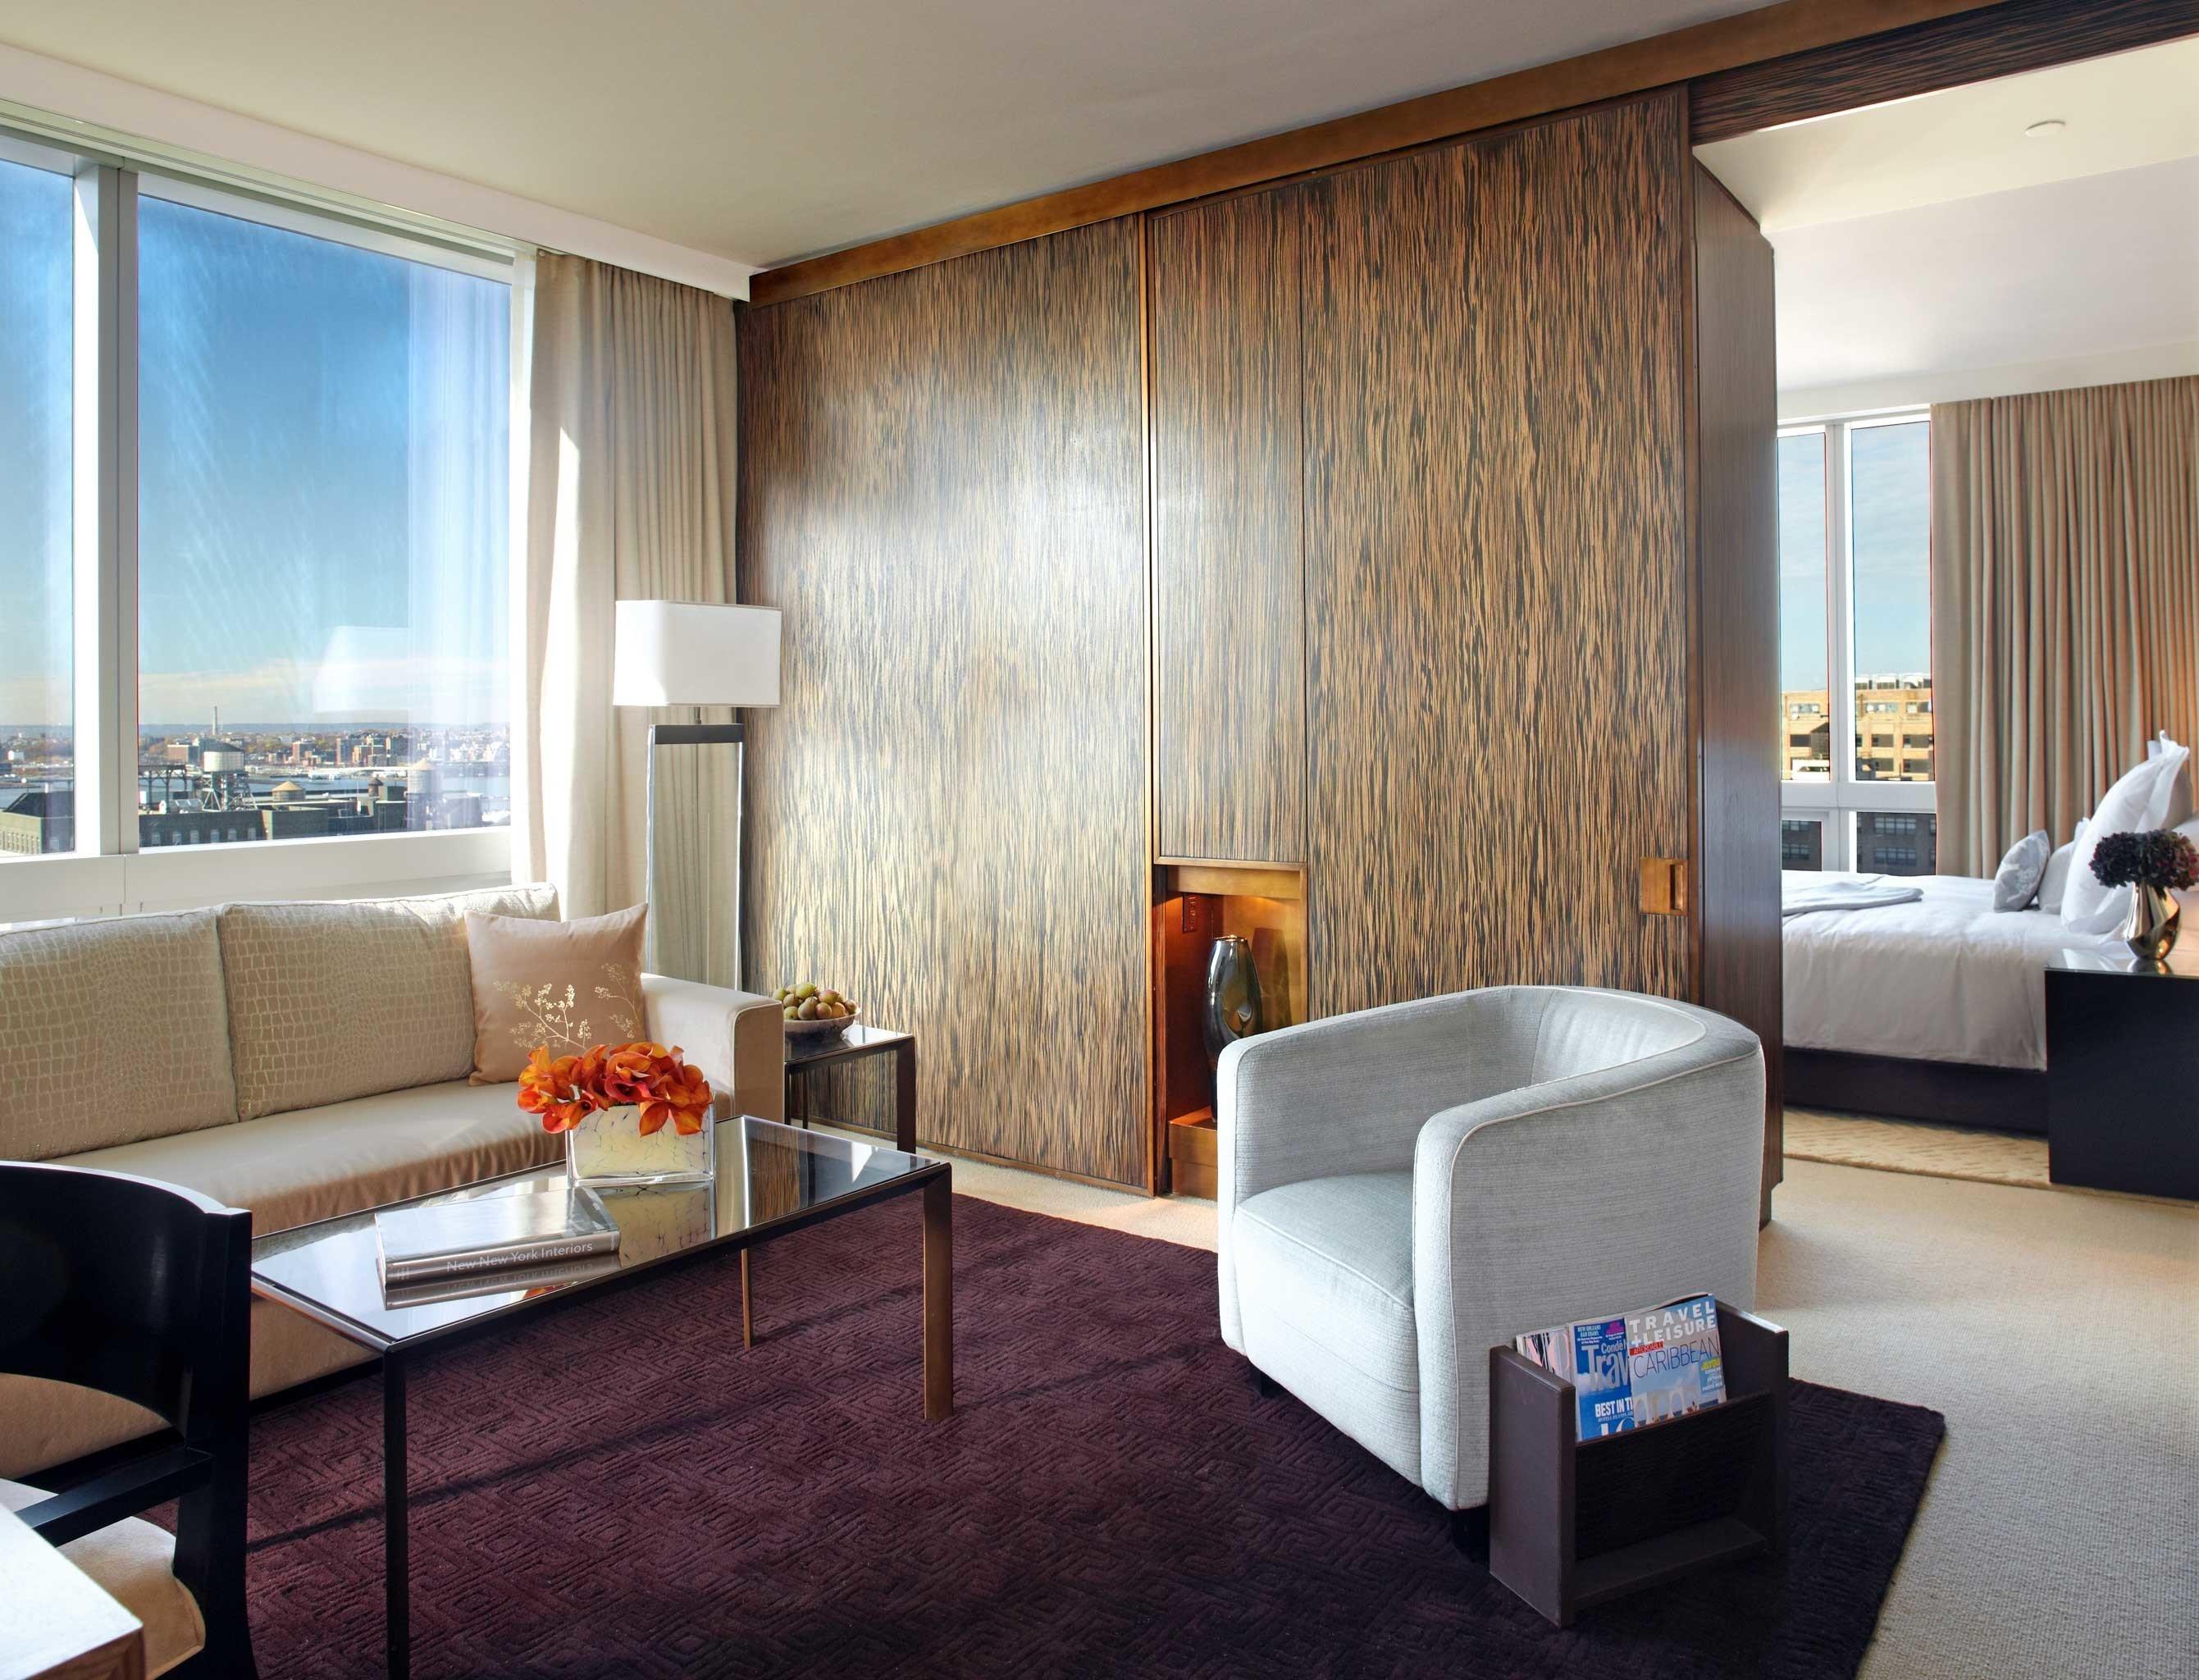 Bedroom City Elegant Luxury sofa property Suite living room condominium cottage Modern